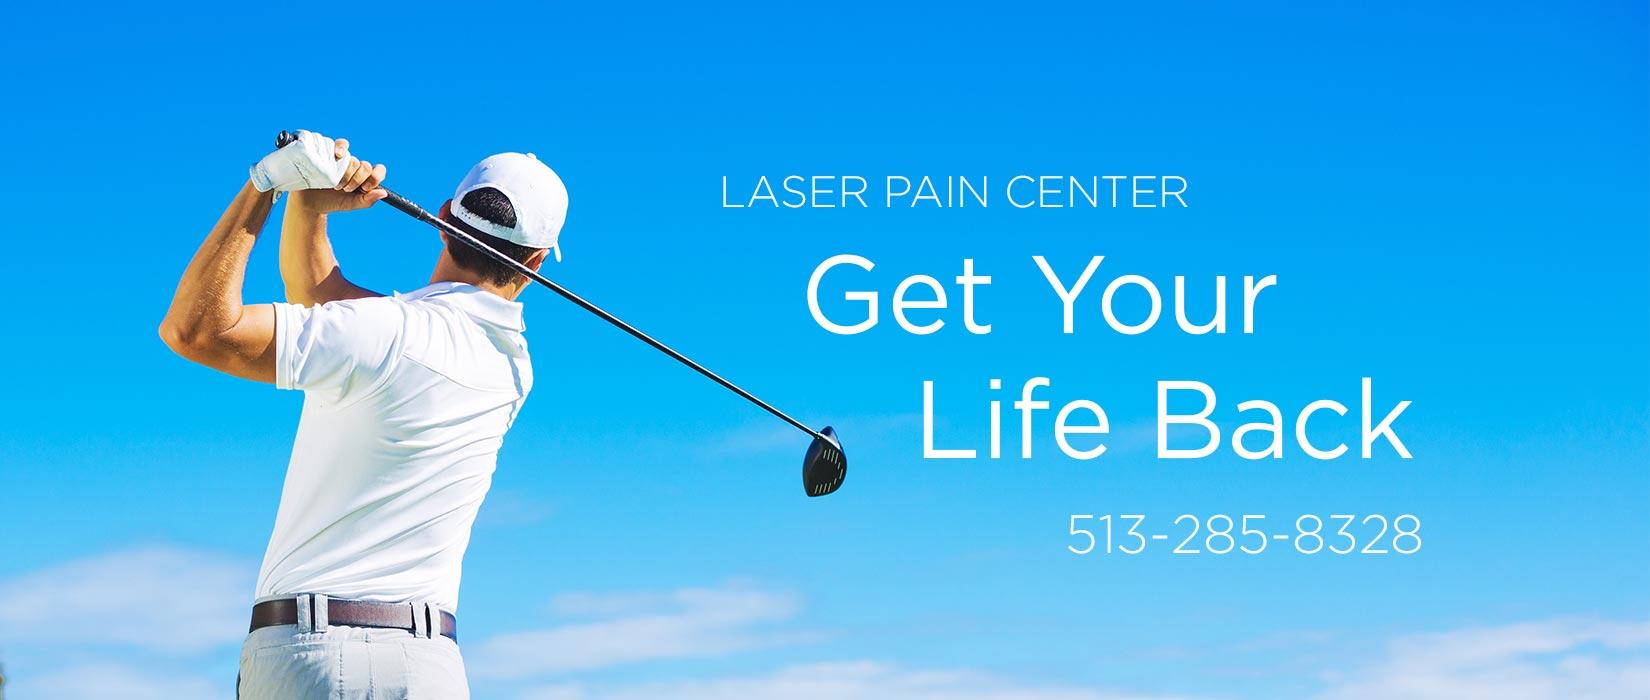 Laser Pain Center - Get Your Life Back